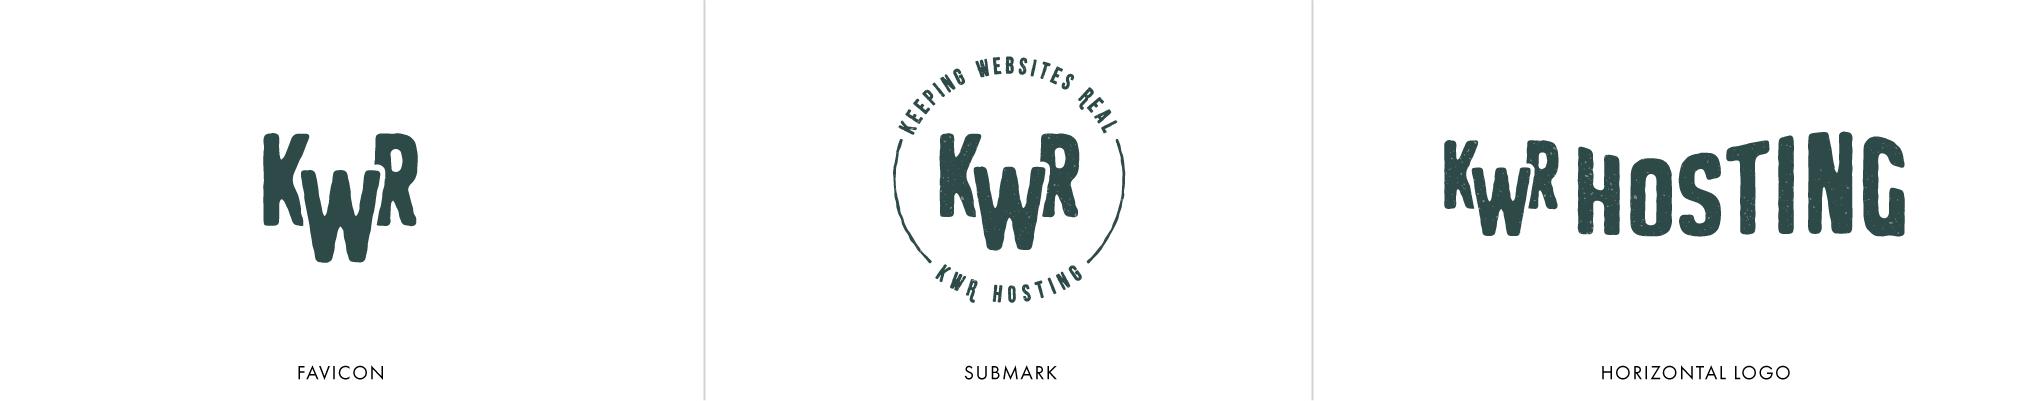 Keeping Websites Real Brand Identity alternate logos